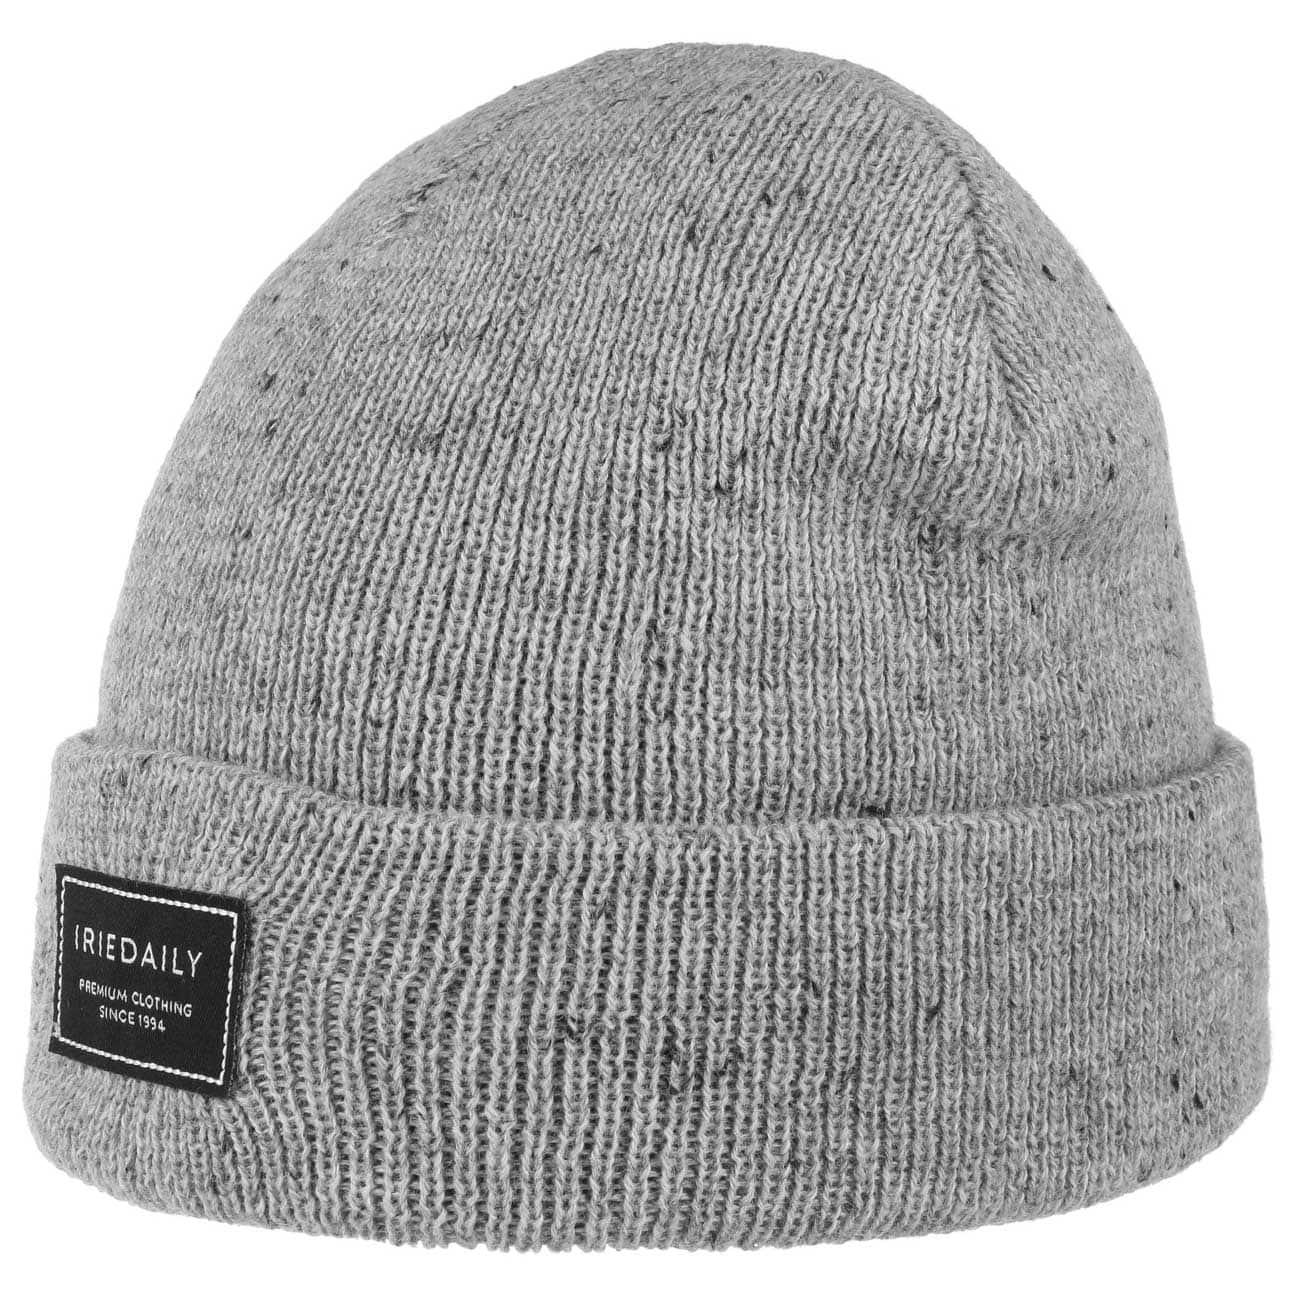 Bonnet Beanie Heavy Tweed by iriedaily  bonnet à revers